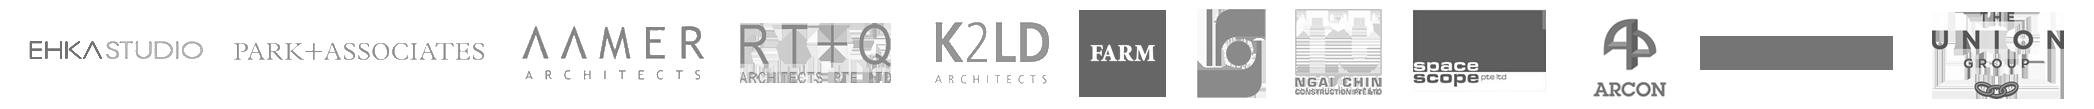 DLE | MPBS | RG ARCHITECTS | NGAI CHIN CONSTRUCTION PTE LTD | RT+Q ARCHITECTS | SO SOFITEL | EUROKARS | PORSCHE | MAZDA